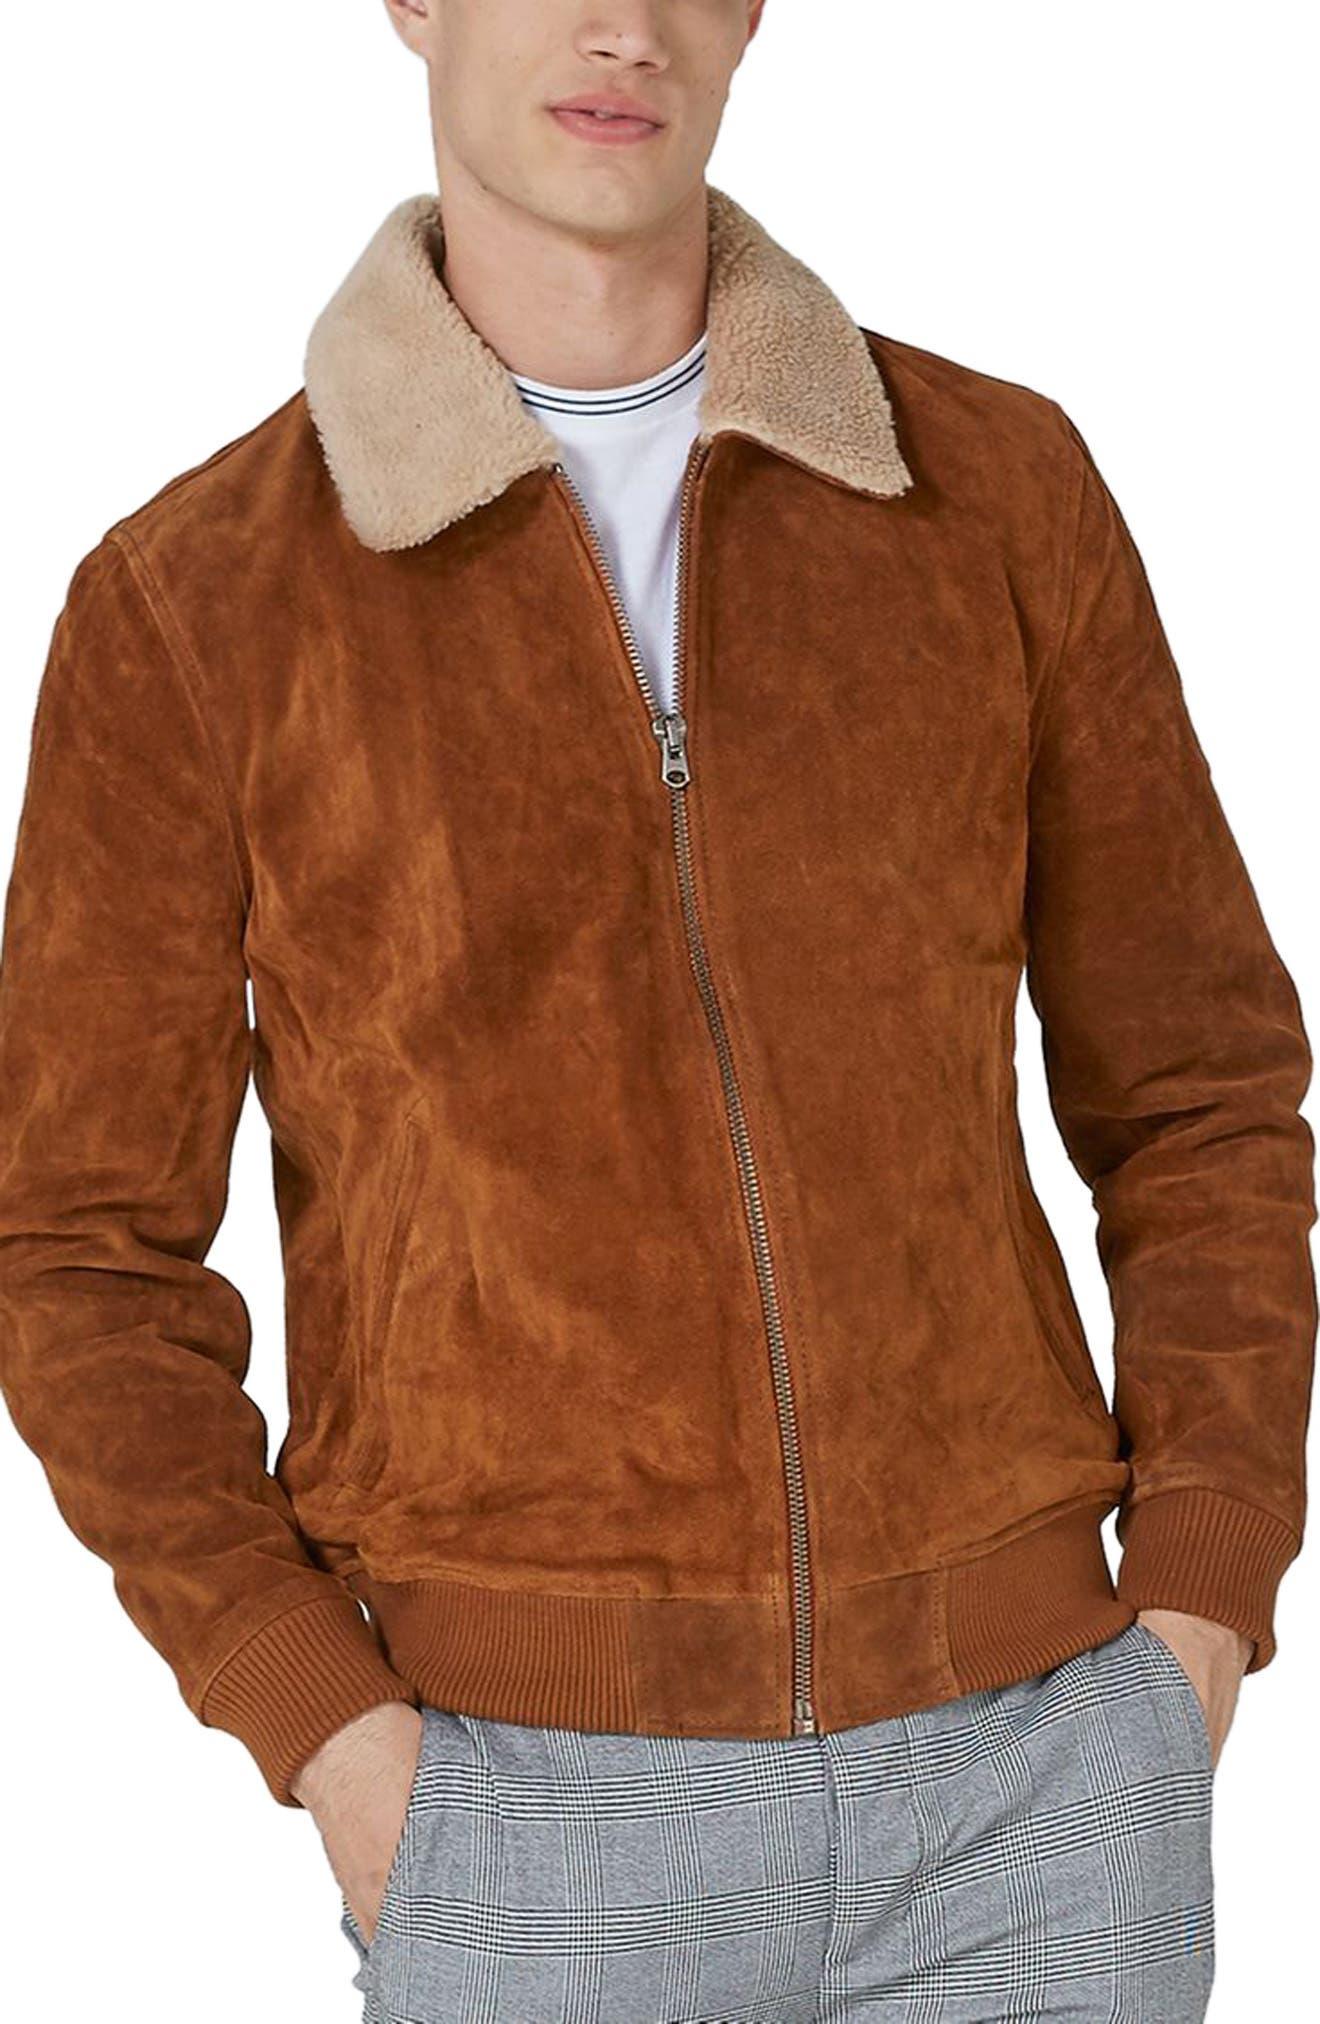 Borg Collar Suede Jacket,                             Main thumbnail 1, color,                             Brown